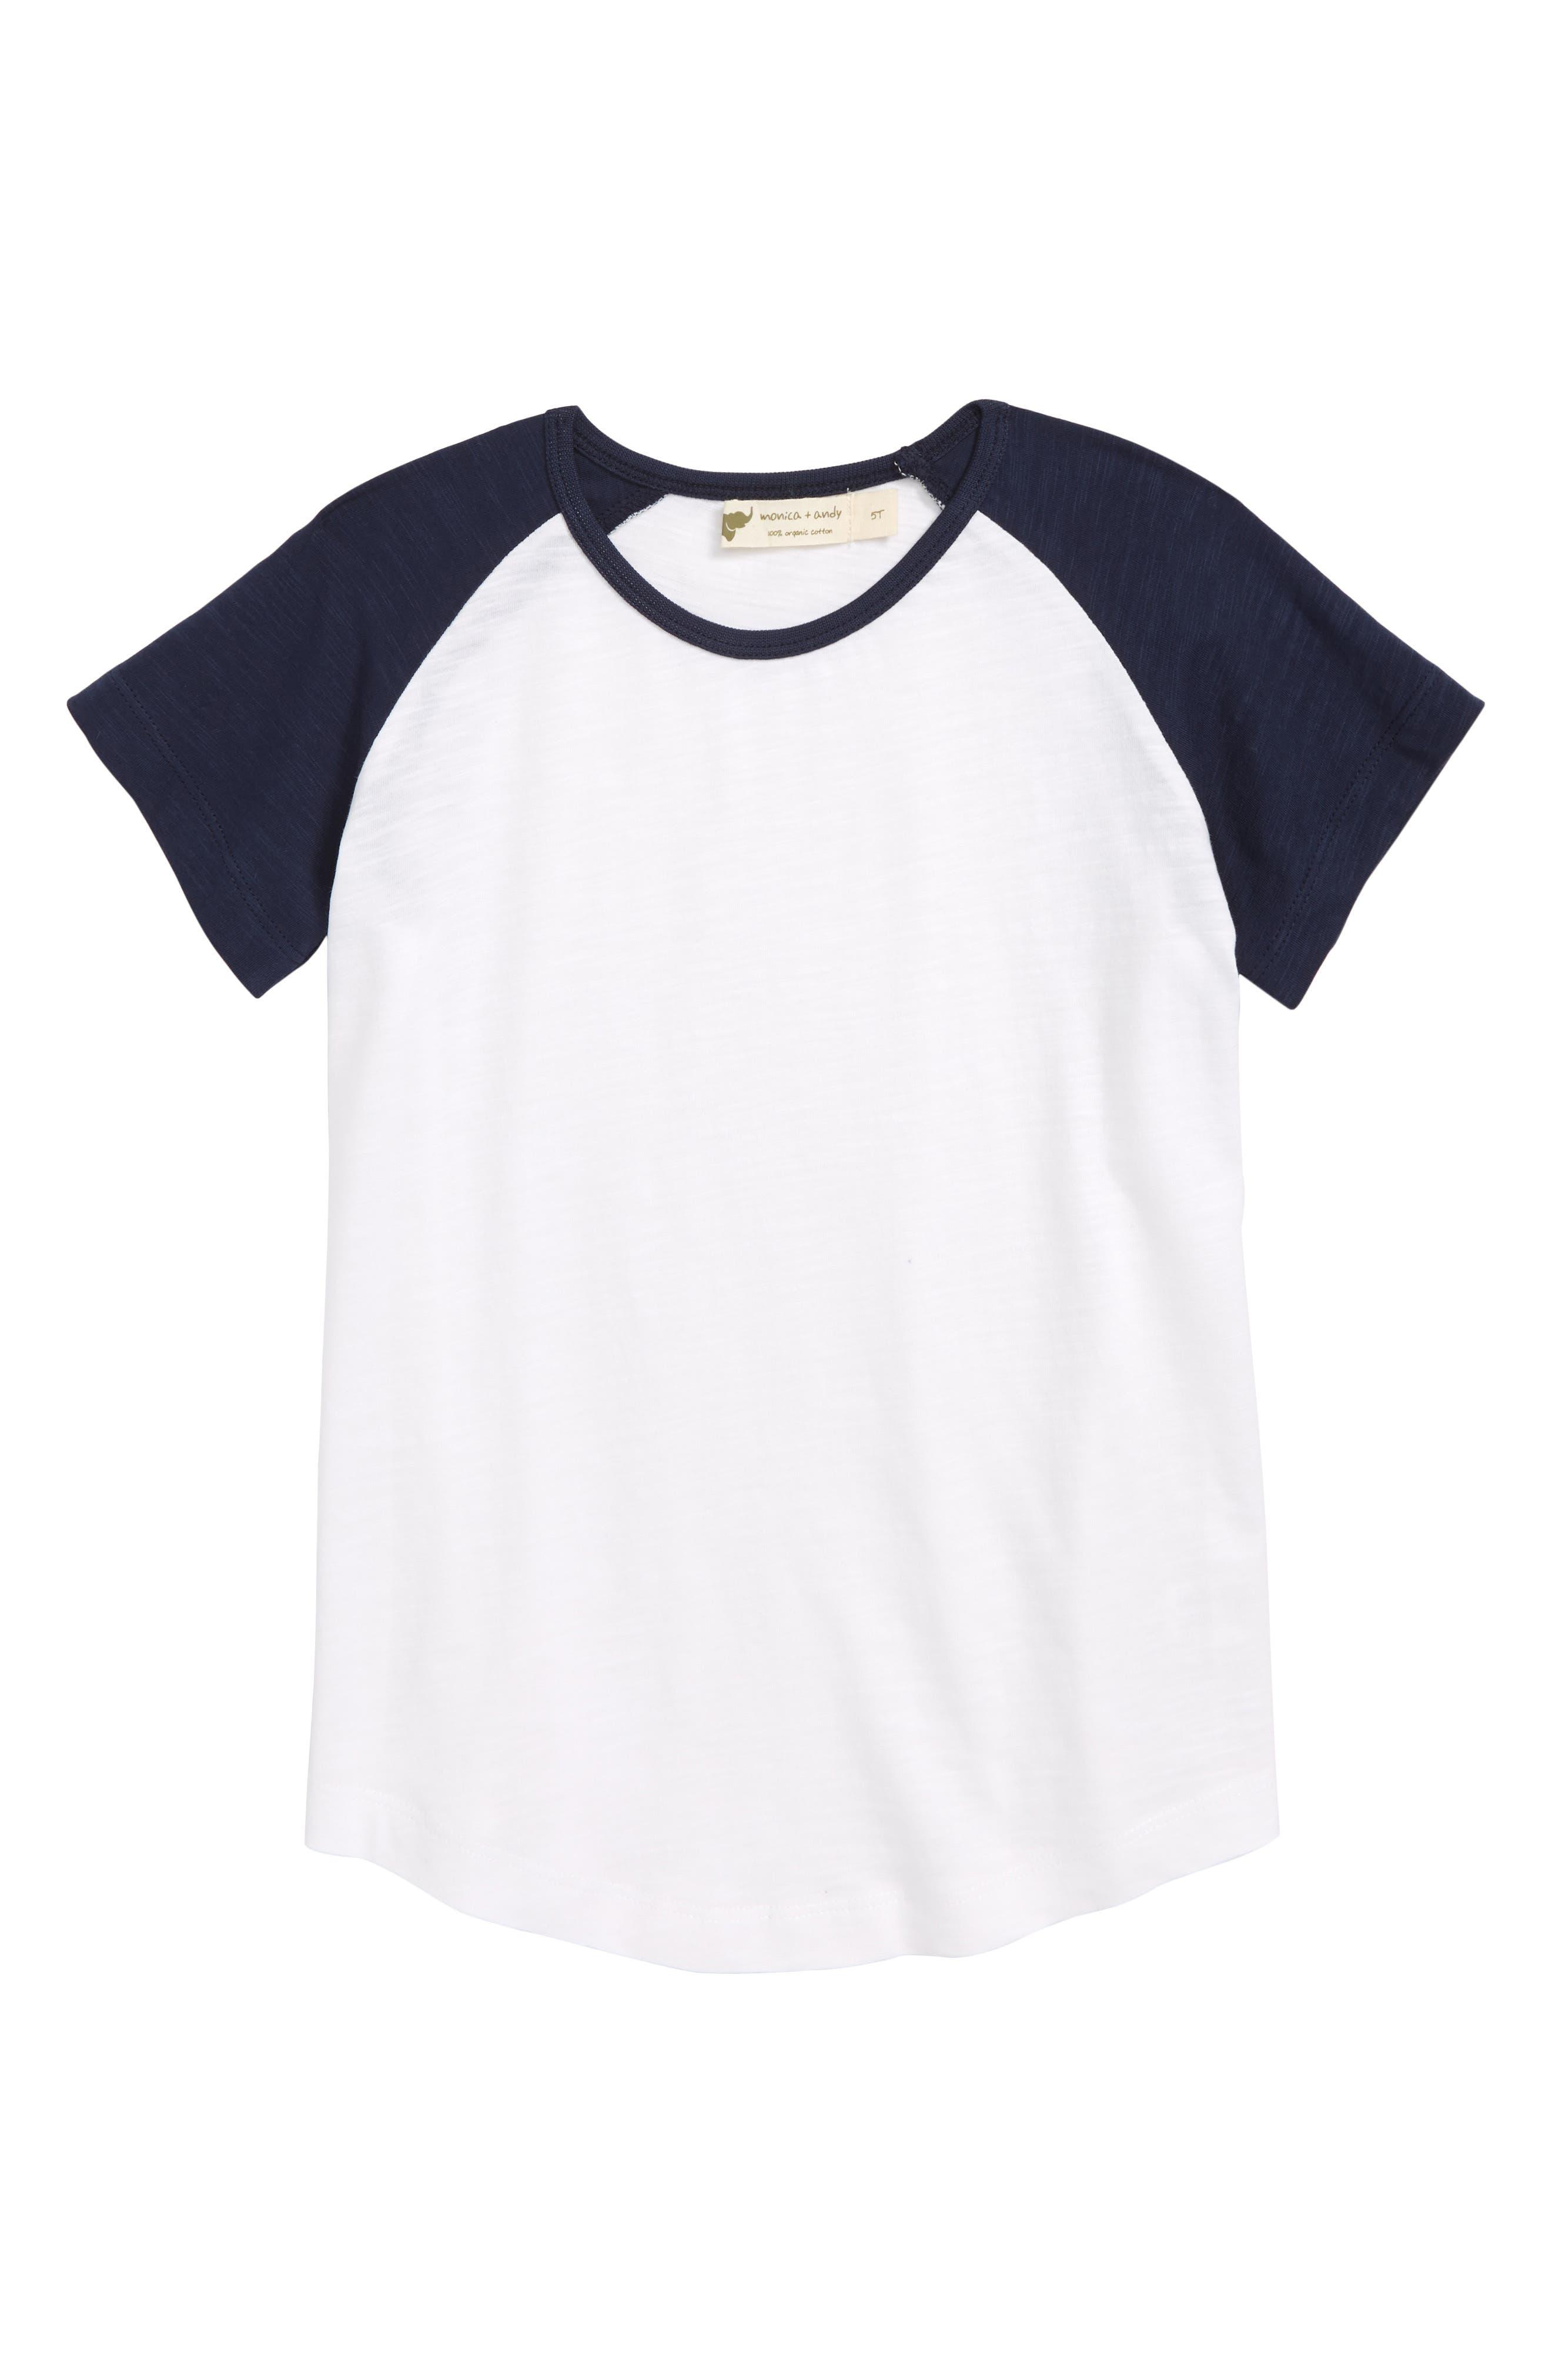 Little Slugger Organic Cotton T-Shirt,                             Main thumbnail 1, color,                             410